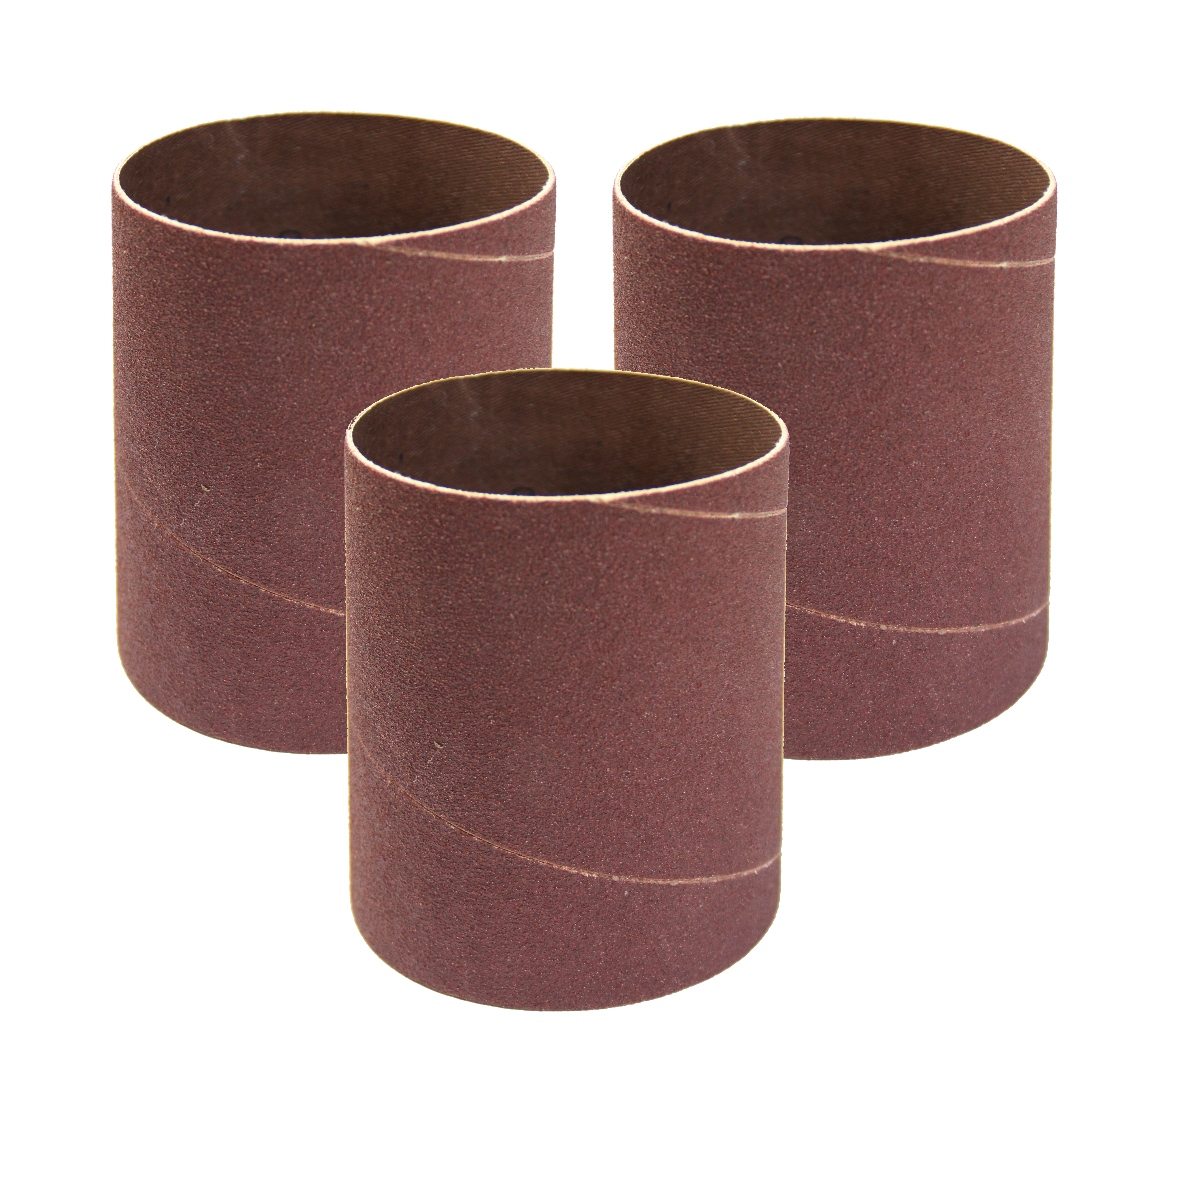 Black+Decker Restorer 3 Pack 120 Grit Sanding Sleeves